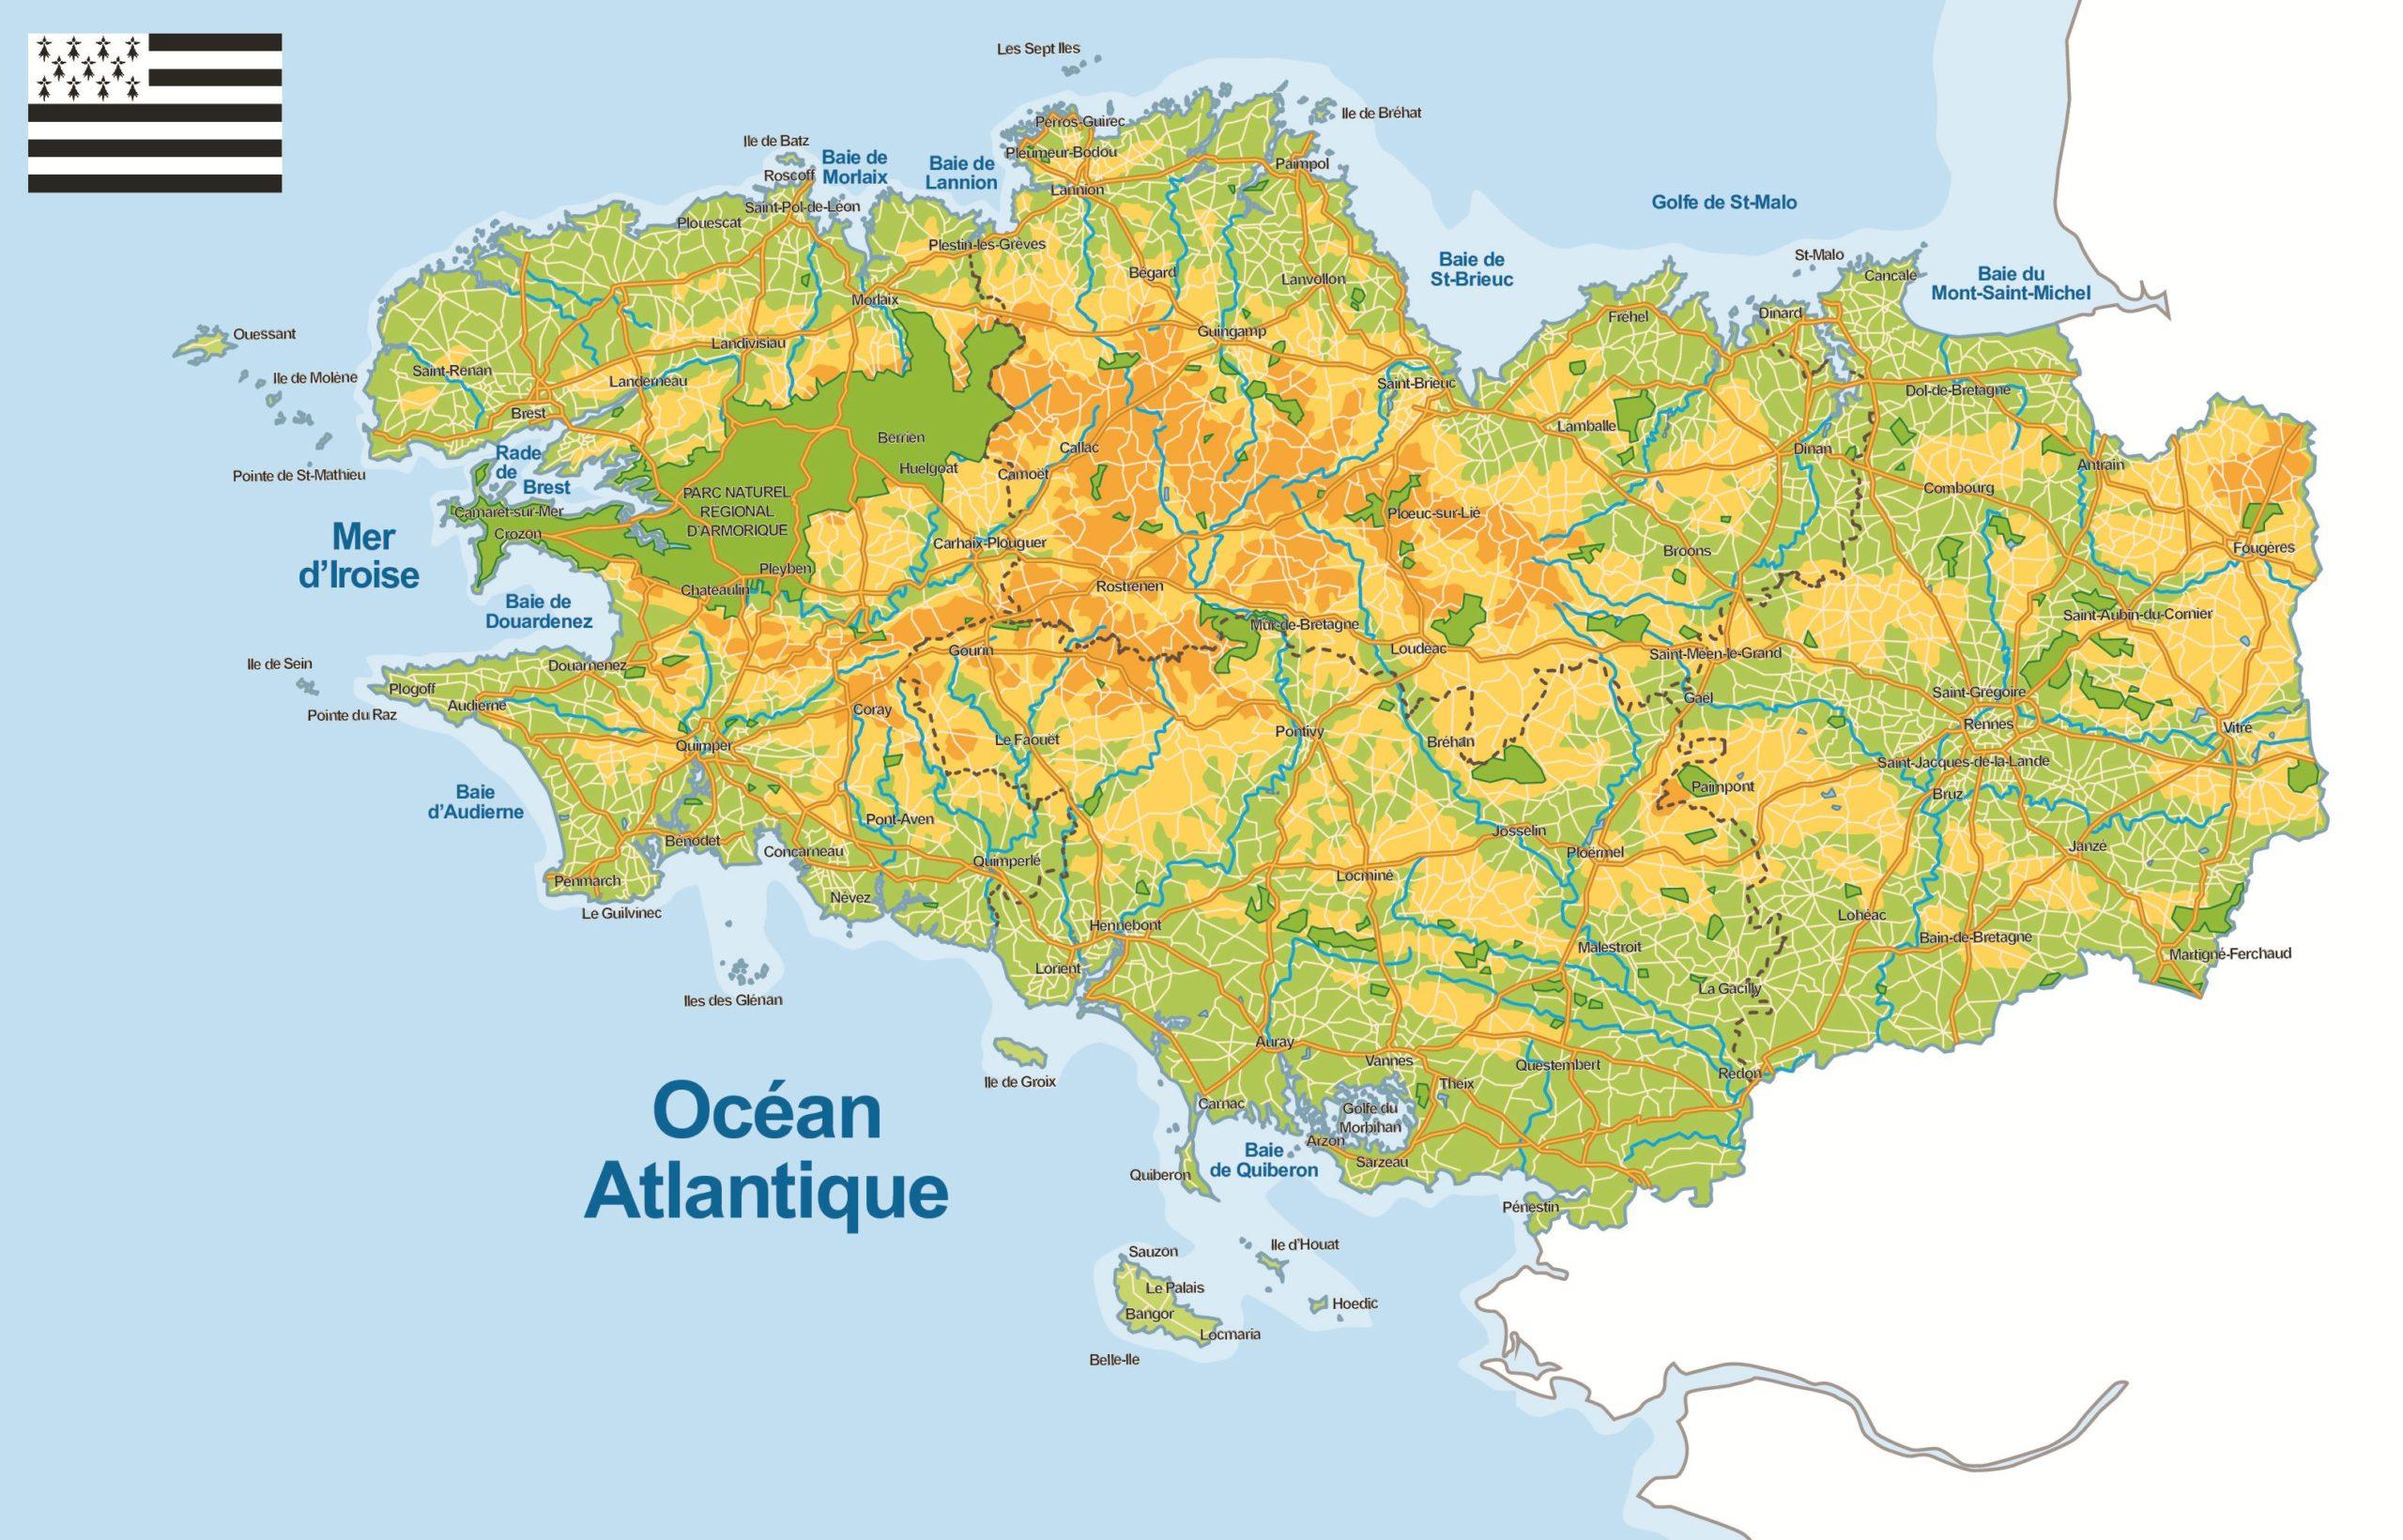 carte de bretagne sud Carte de la Bretagne (administrative)   Villes, relief